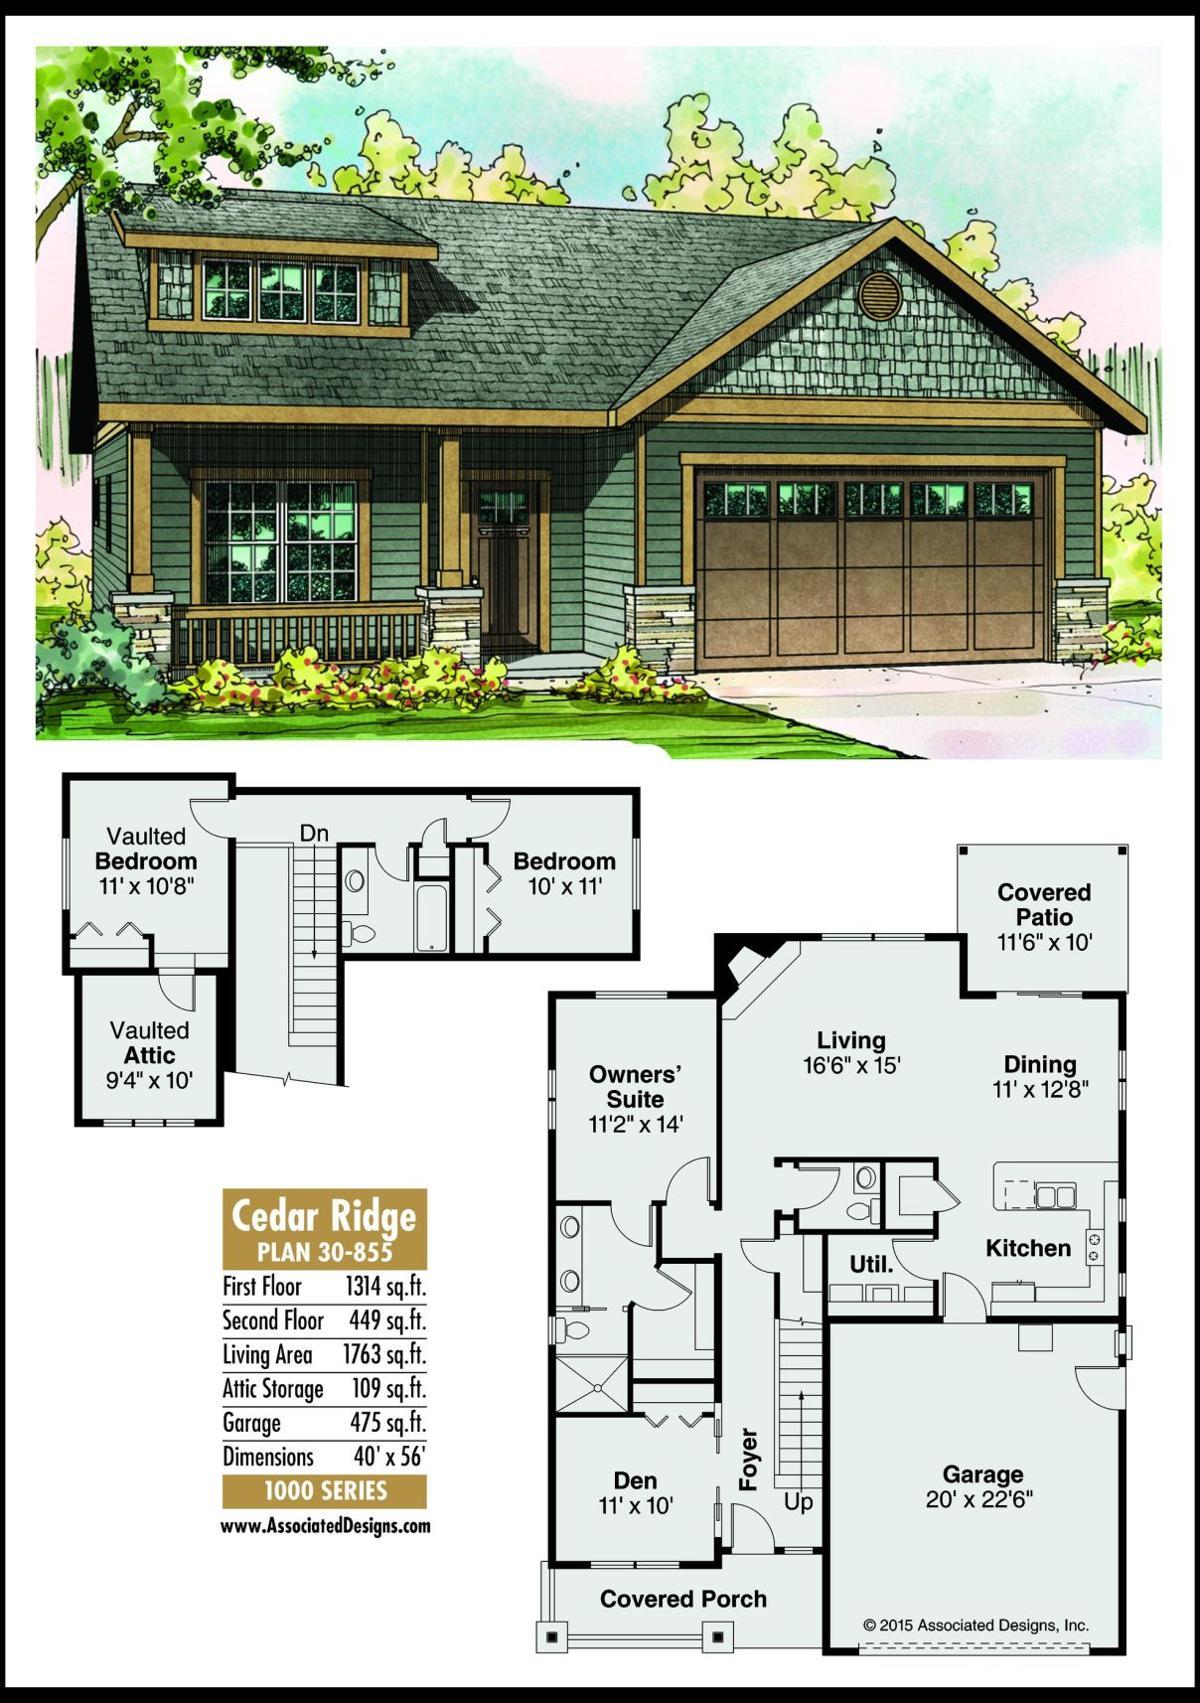 This week's house plan Cedar Ridge 30-855